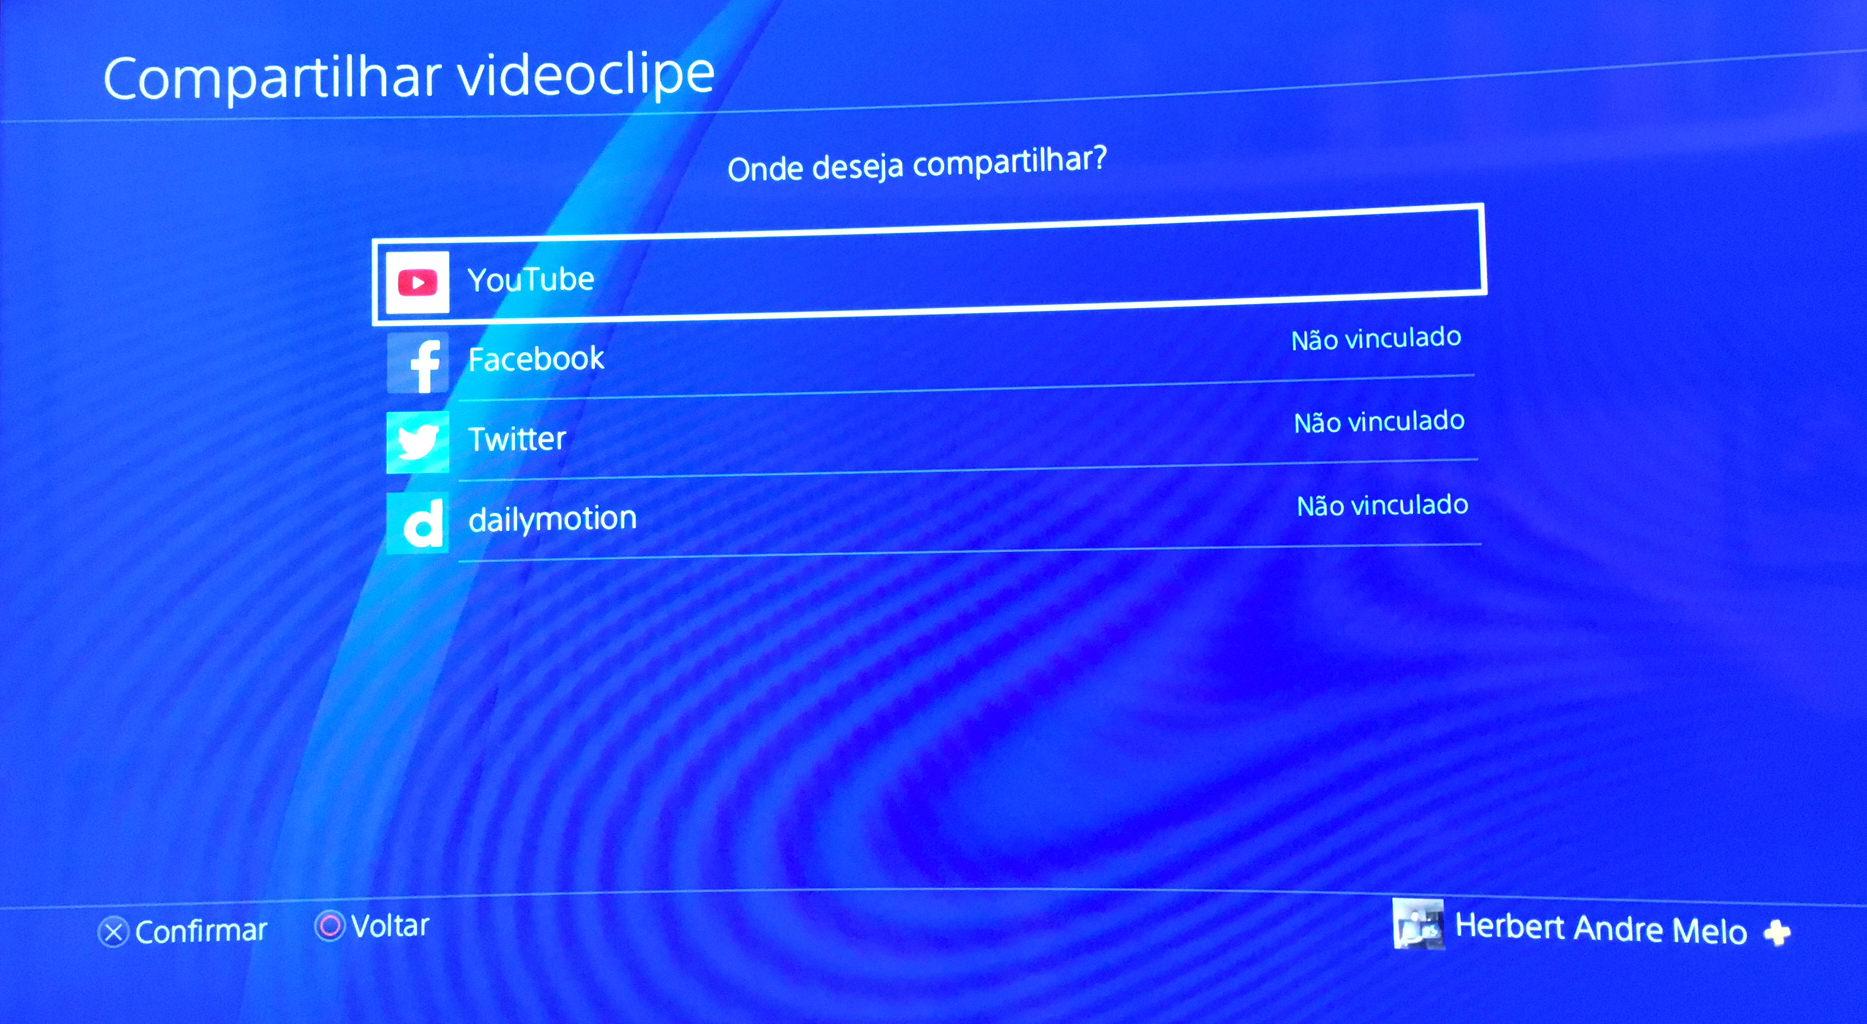 Como capturar vídeos no PS4 e subir diretamente para o Youtube?